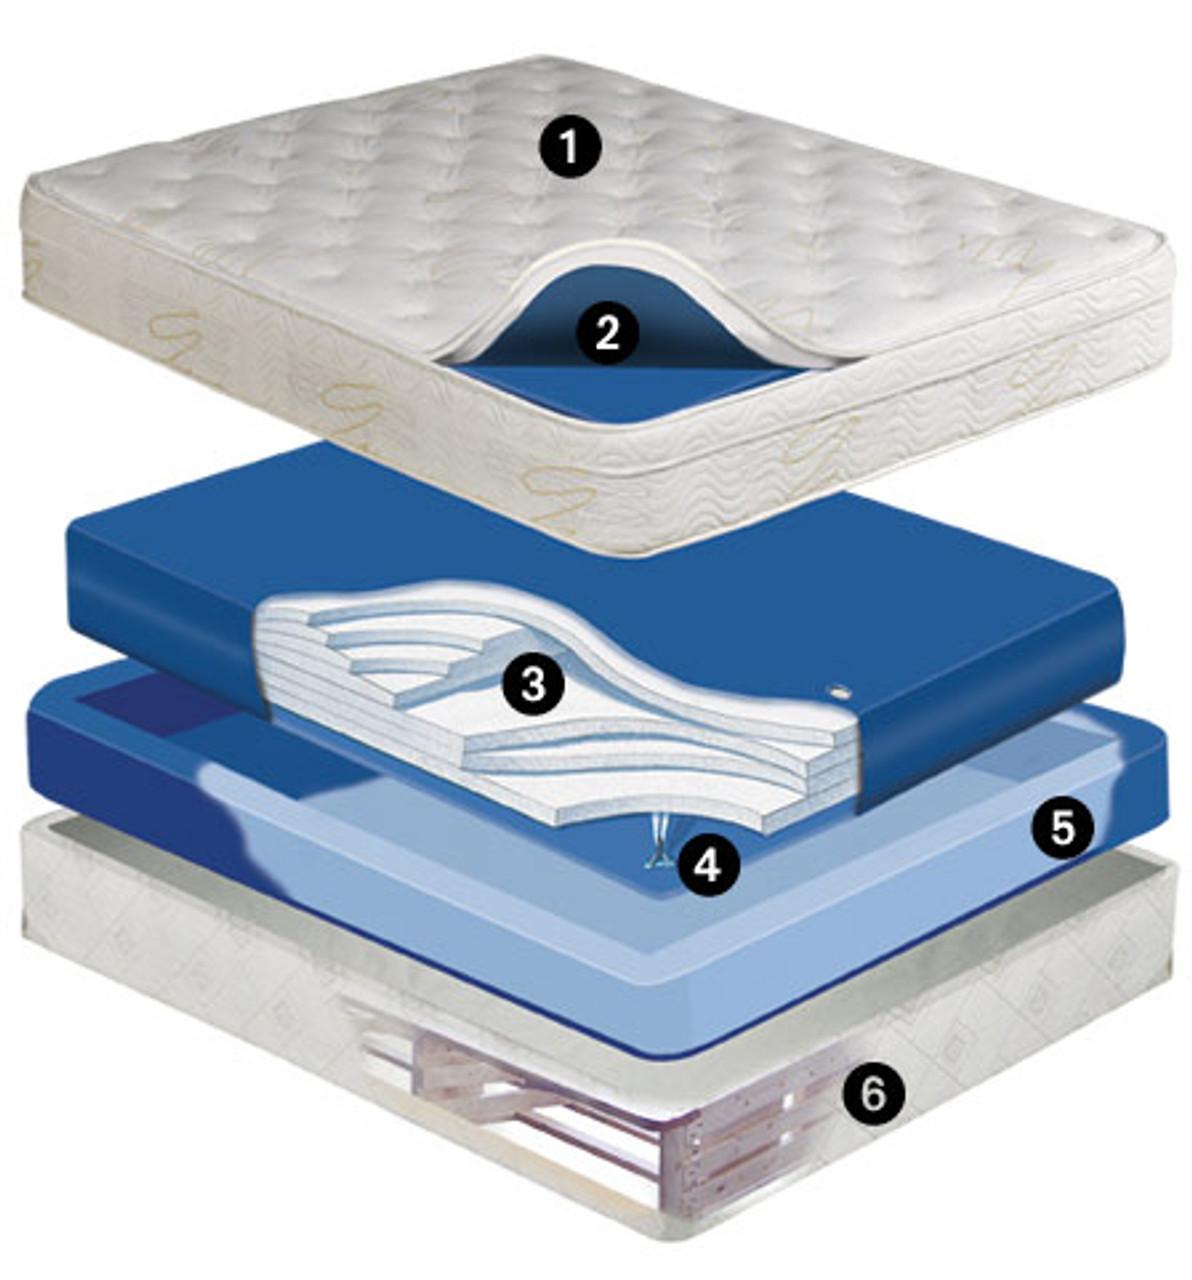 Equinox Deep Fill 9 inch Softside Waterbed Mattress Waveless Mattress